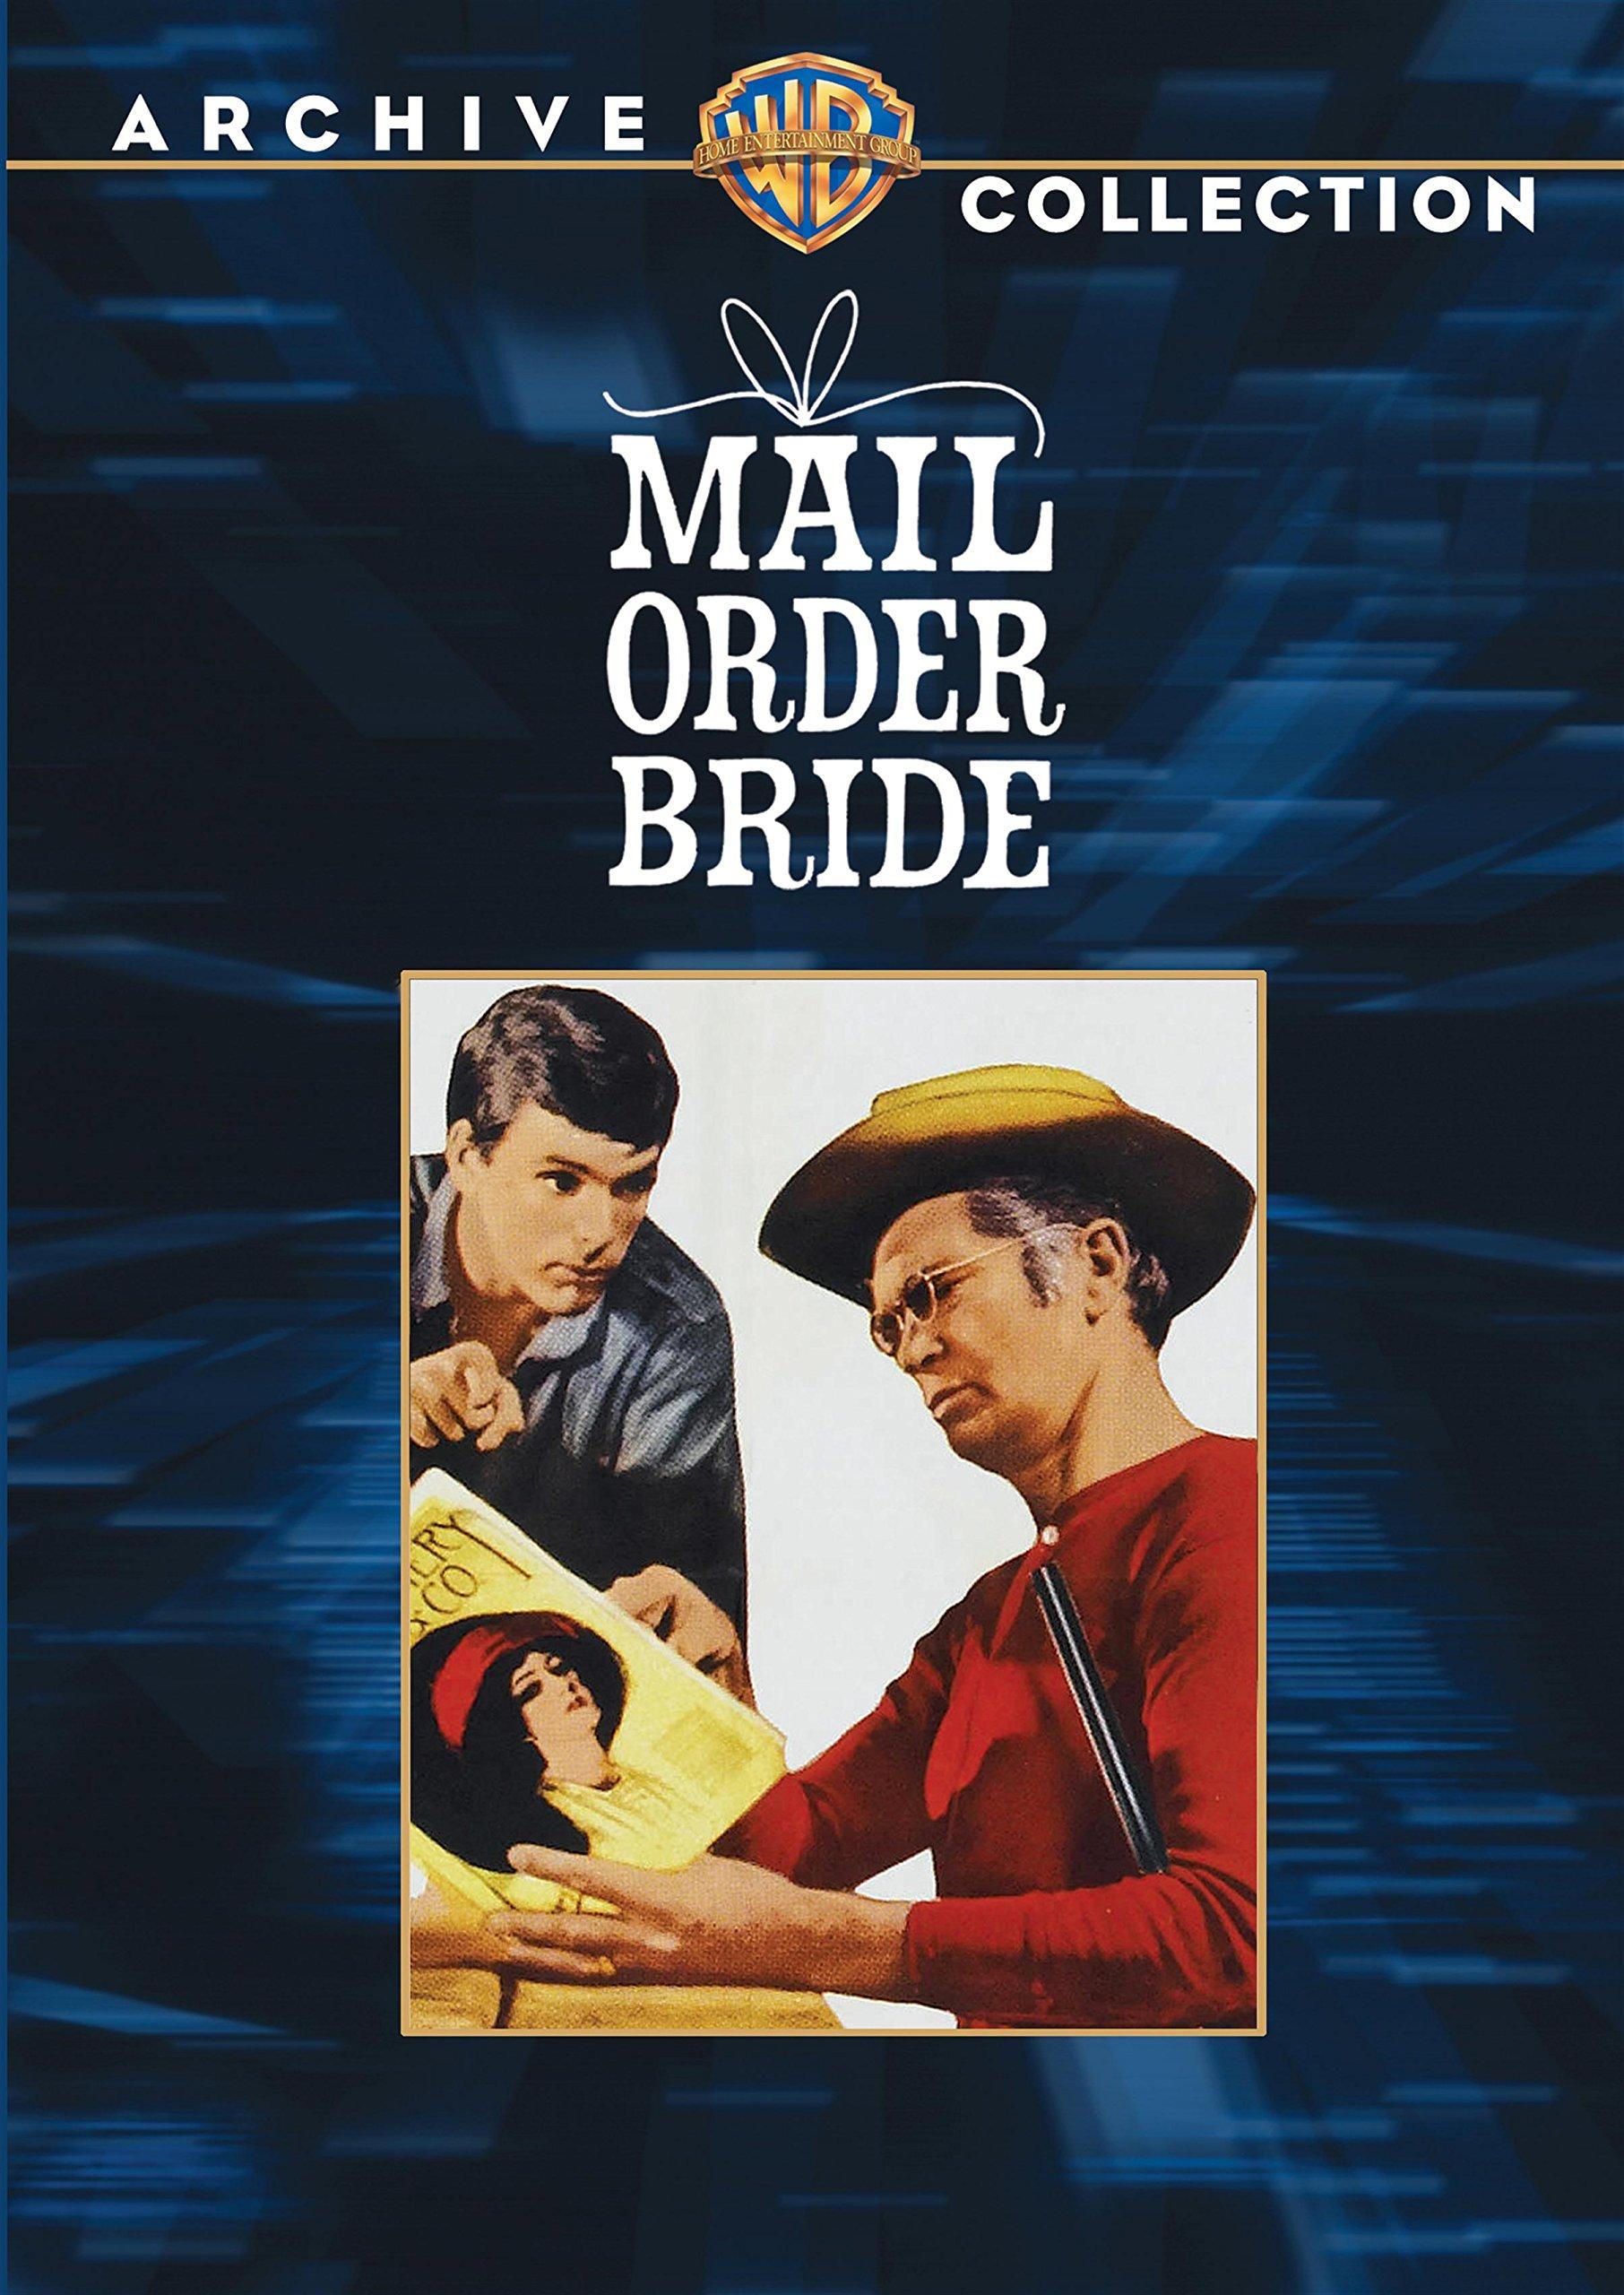 Mail order bride 1963